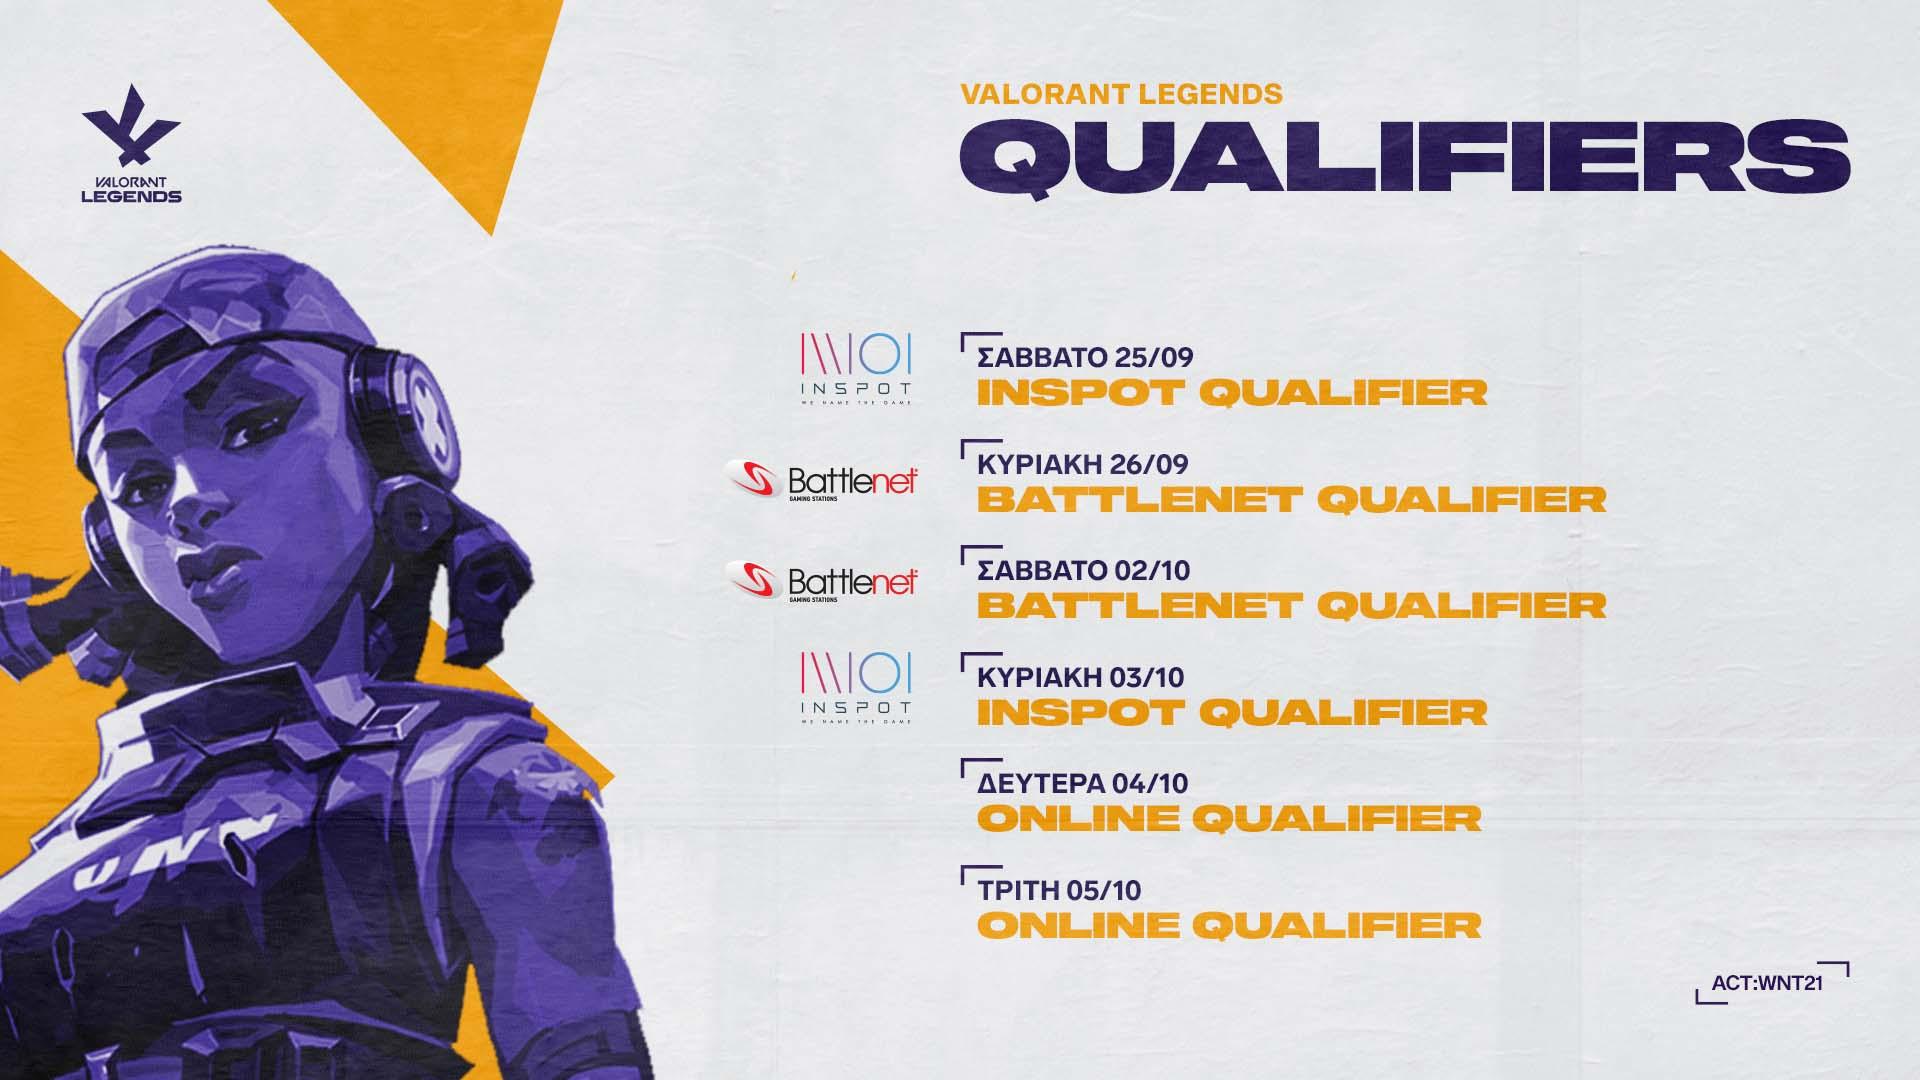 VALORANT LEGENDS: Open Qualifiers